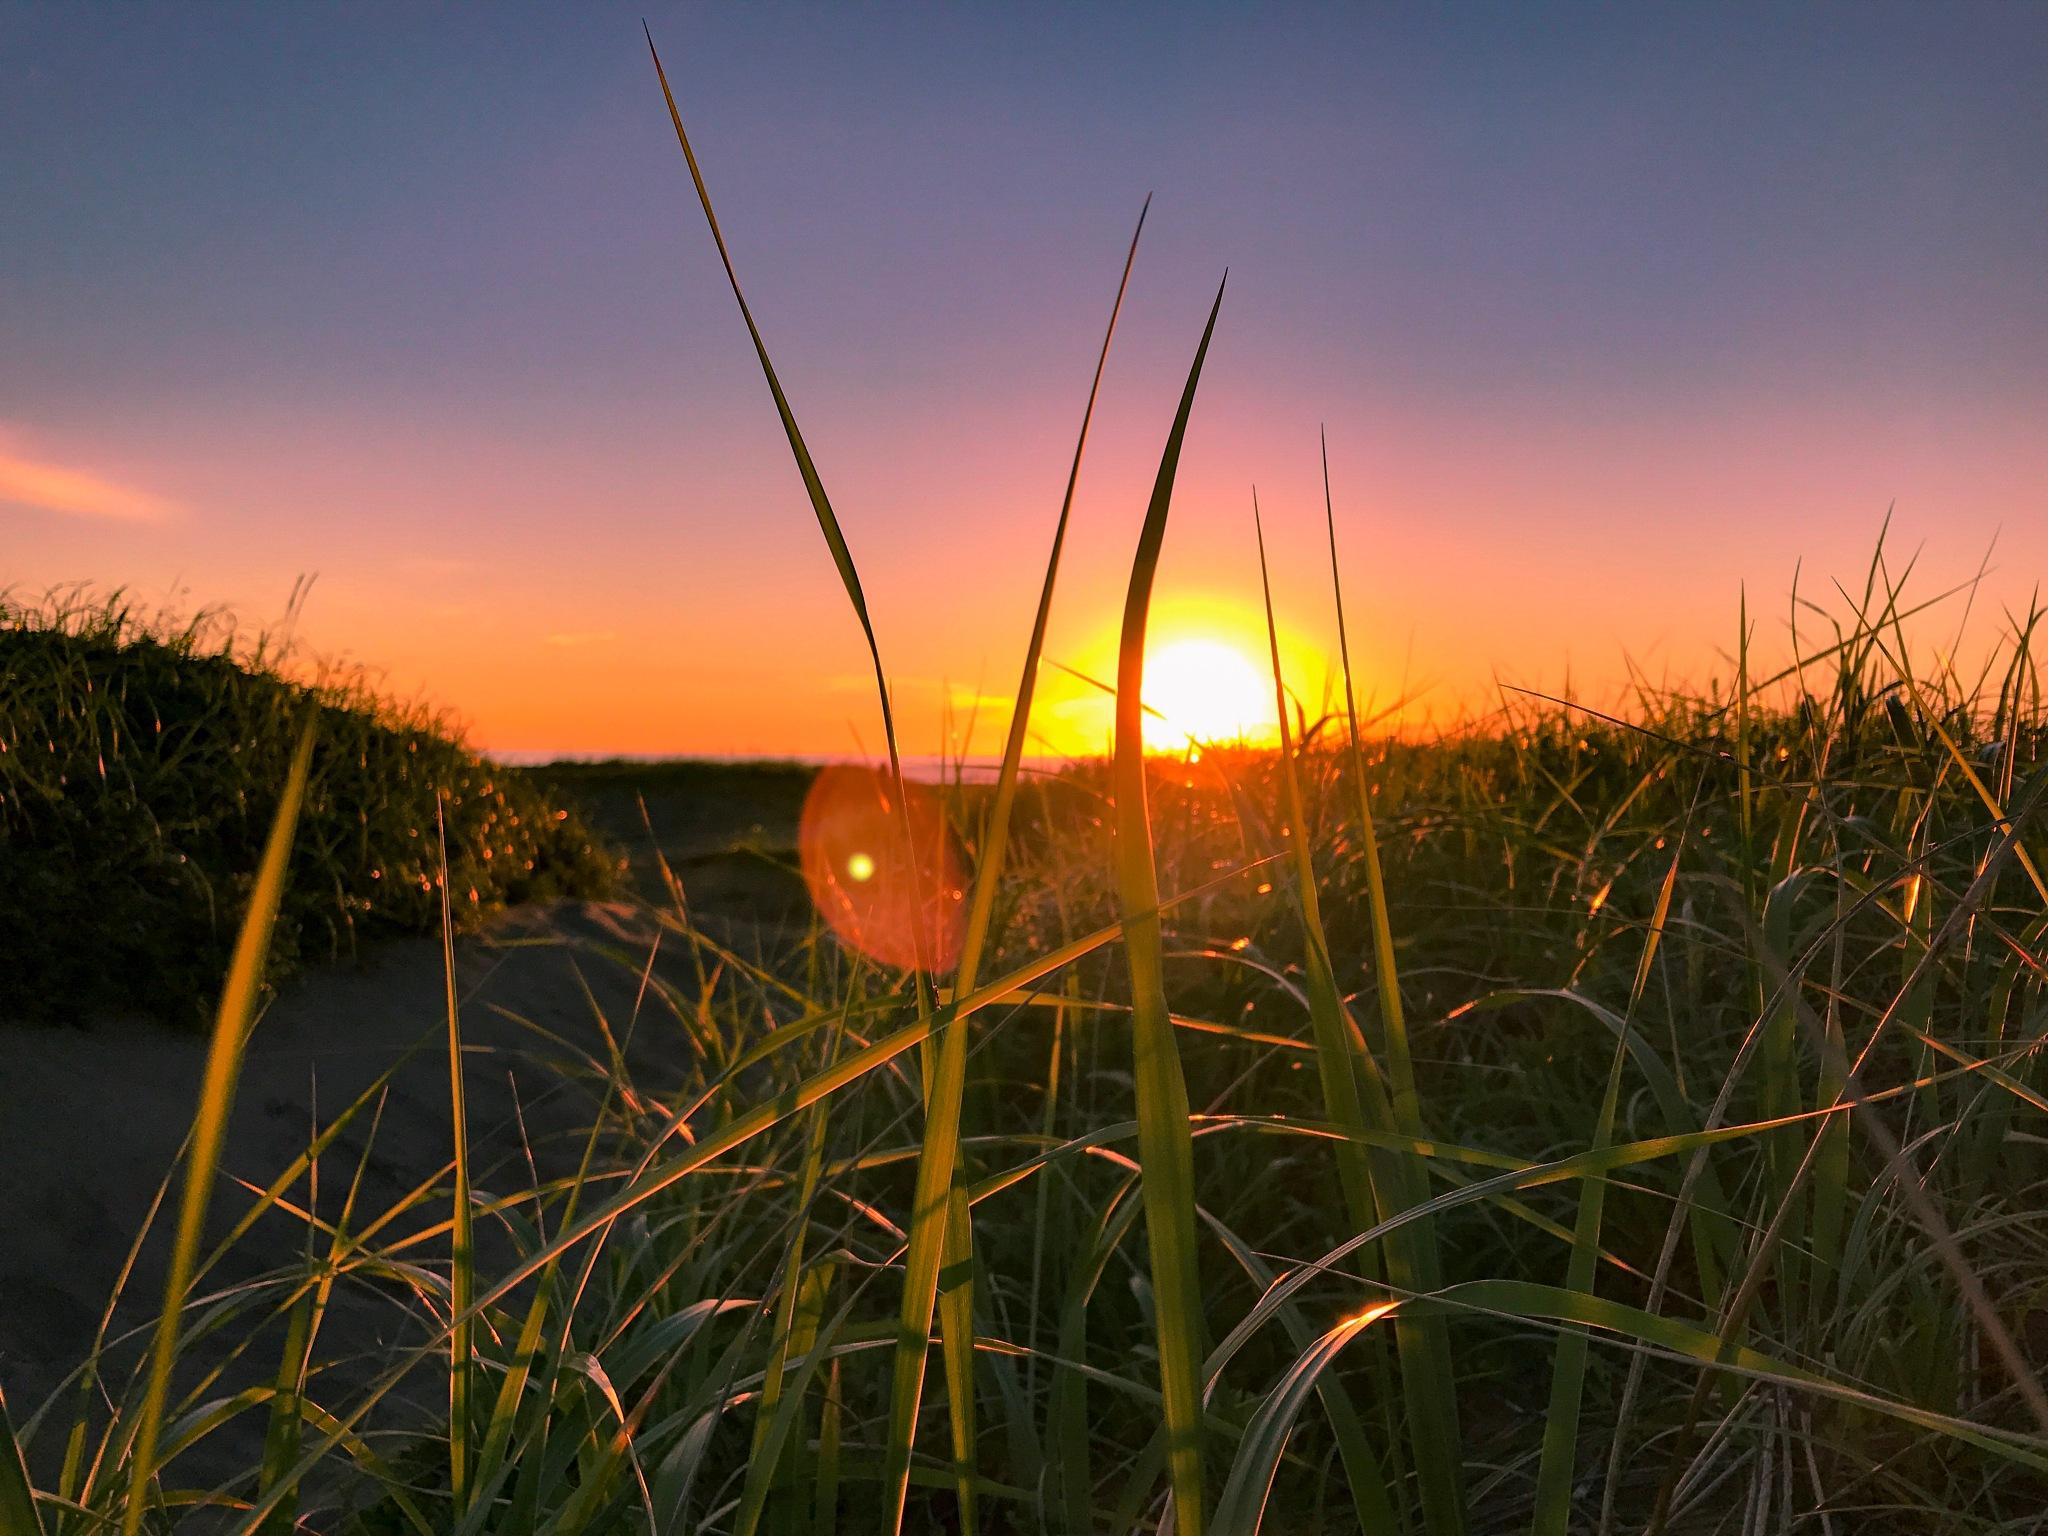 Sunset by Vladimir Sakharov